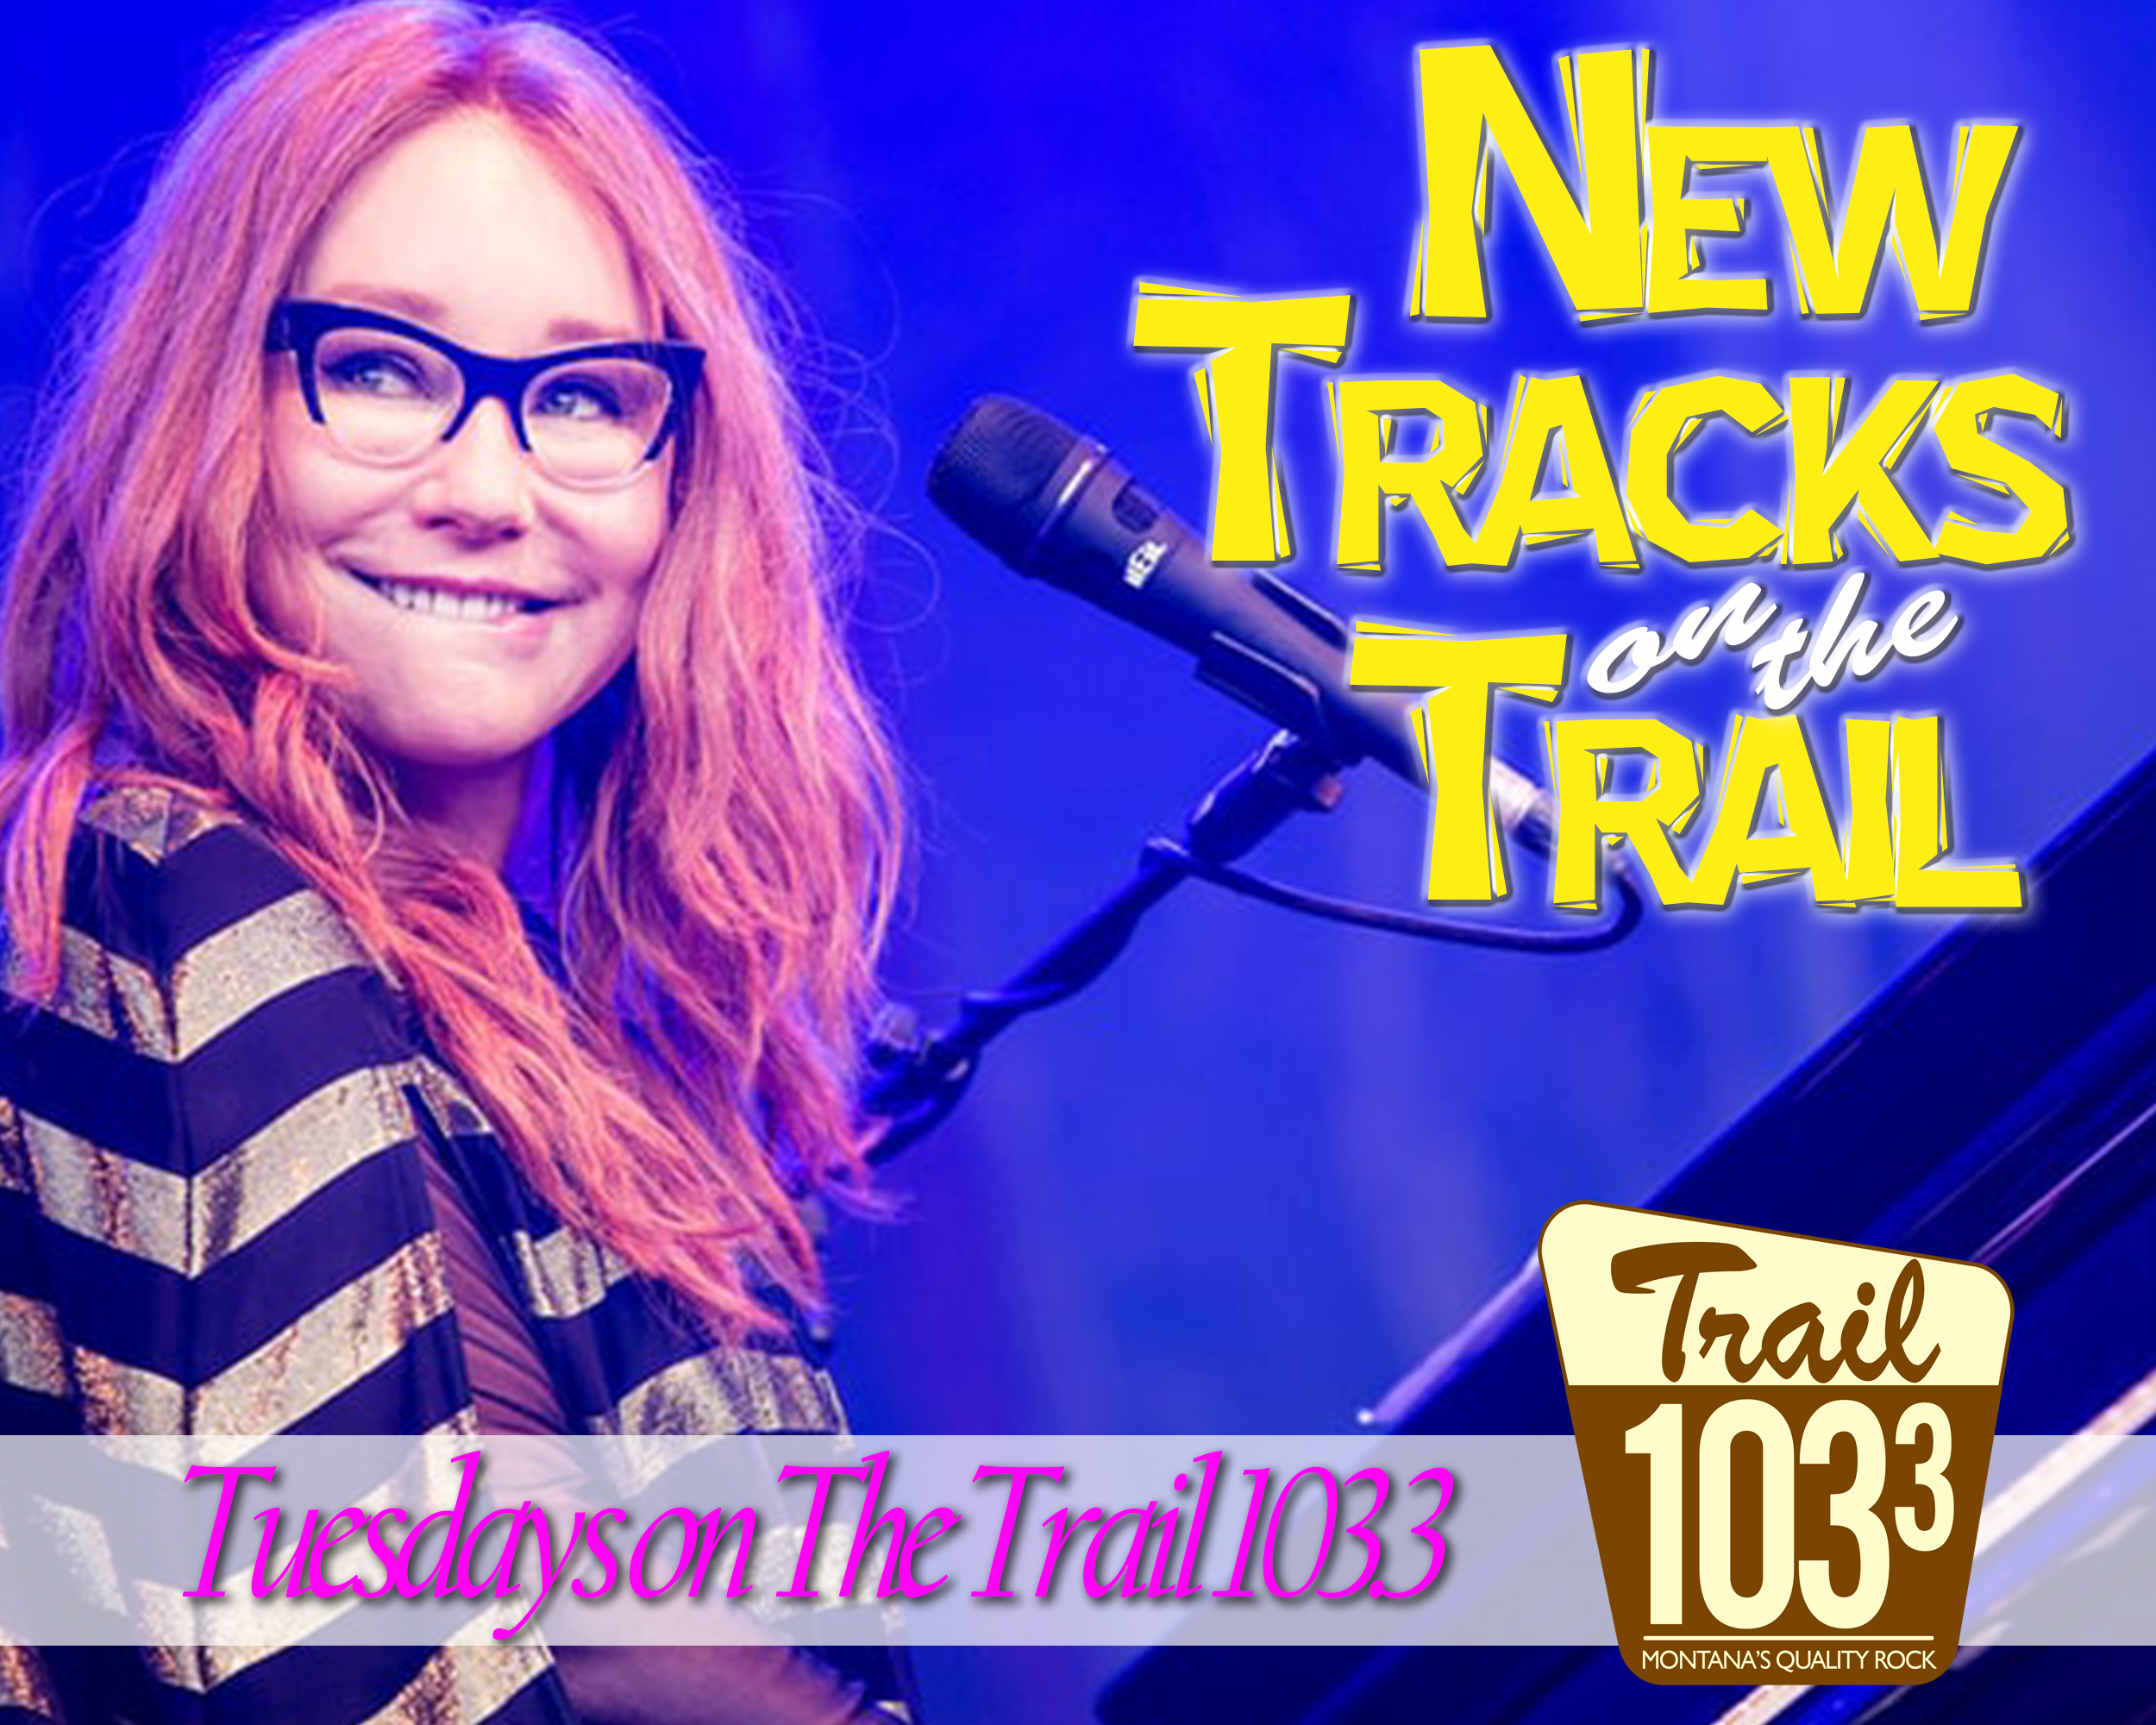 New Tracks 8/29